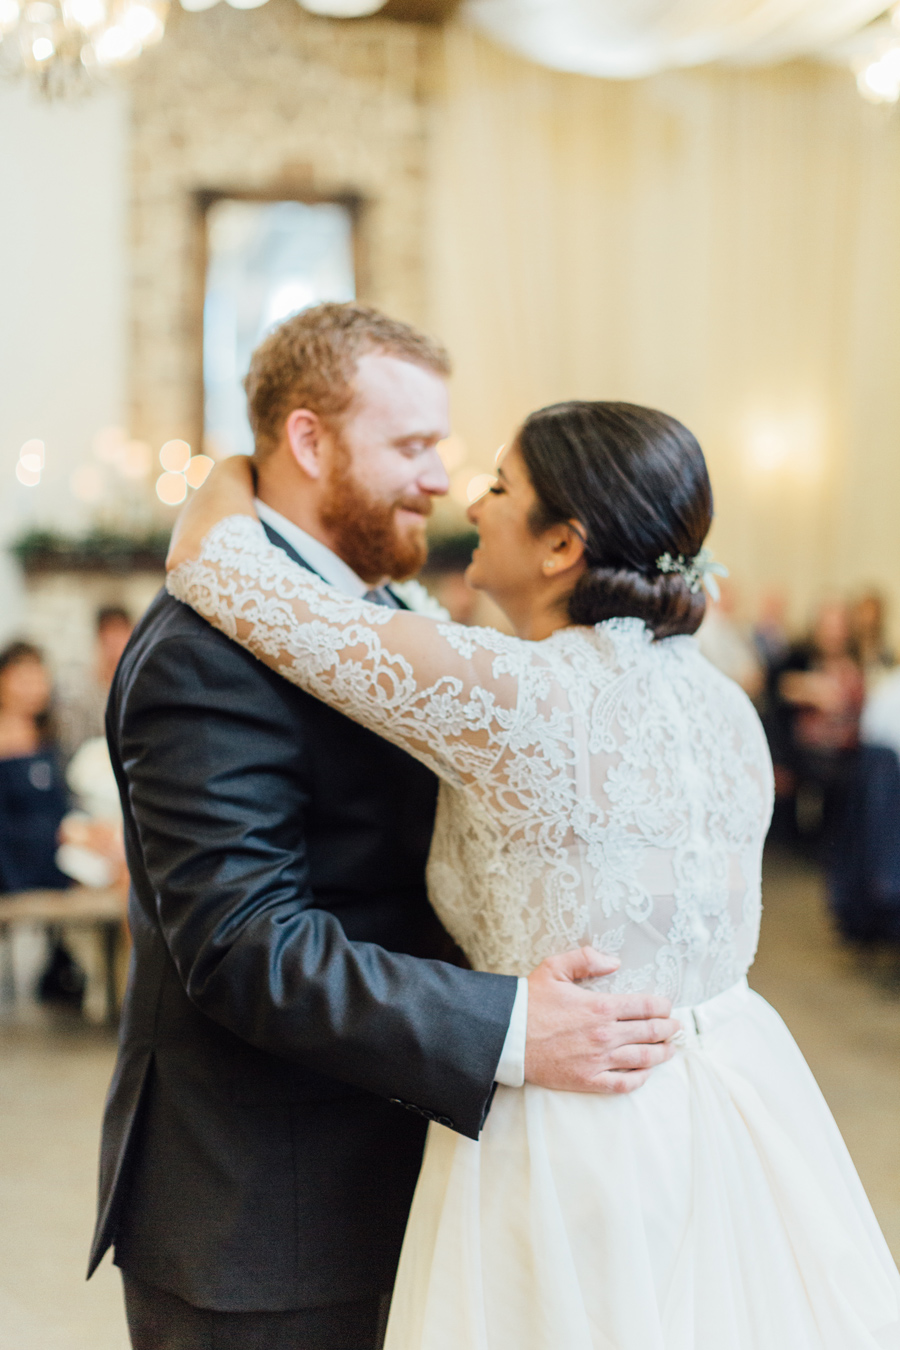 the-inn-at-leola-wedding-lancaster-pennsylvania-wedding-photographer-rebeka-viola-photograhy (110).jpg